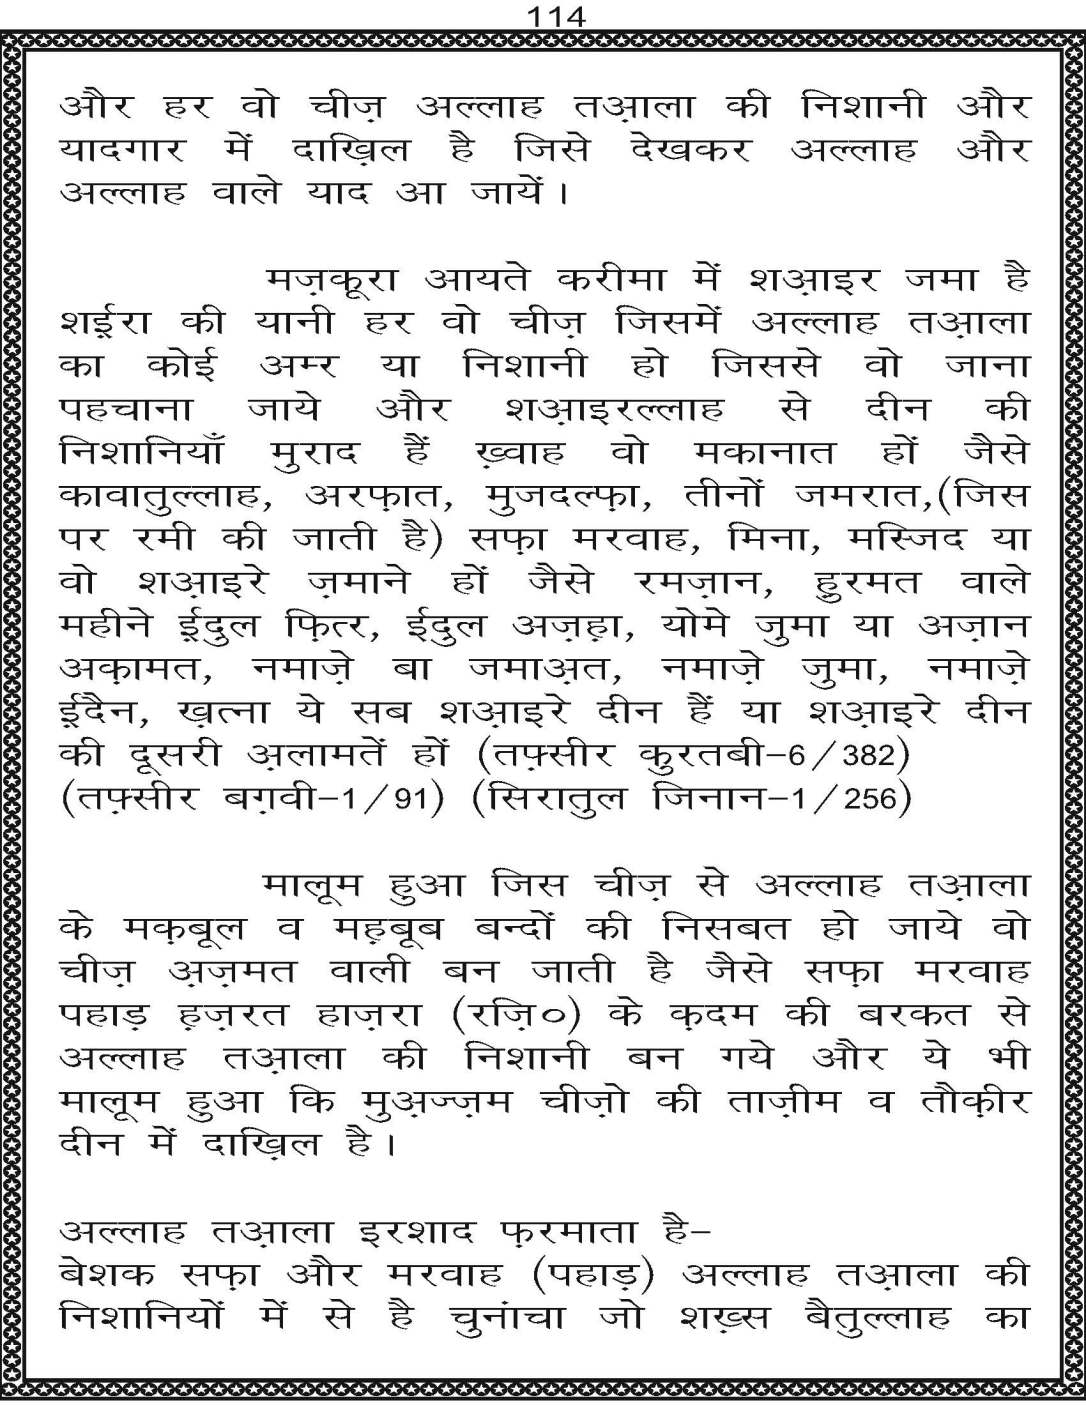 AzmateTaziyadari_Page_114